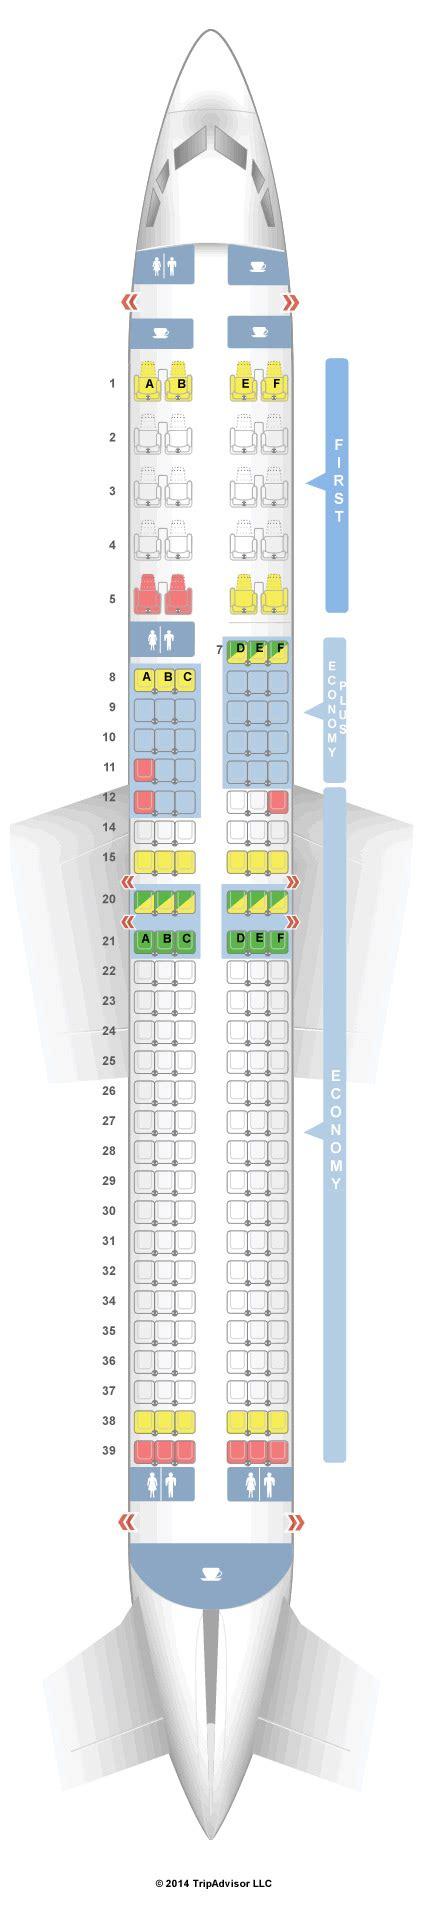 seatguru seat map united boeing 737 900 739 v3